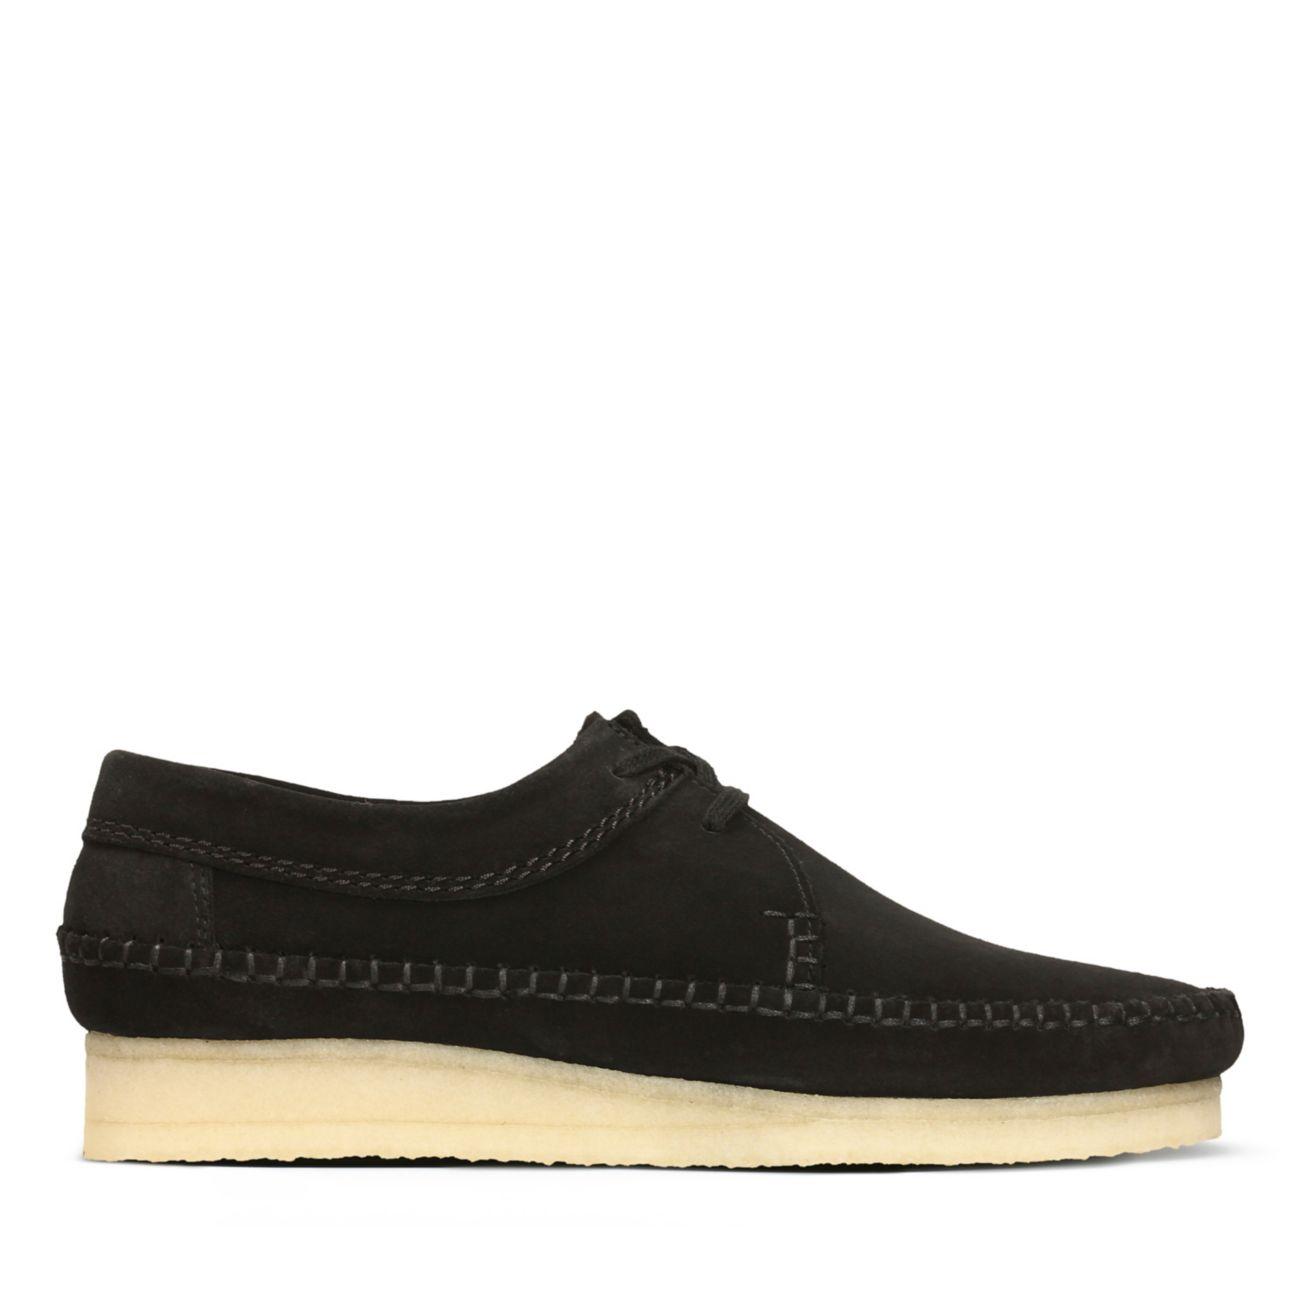 90b01f84 Weaver Black Suede - Clarks Original Shoes for Men - Clarks® Shoes Official  Site | Clarks